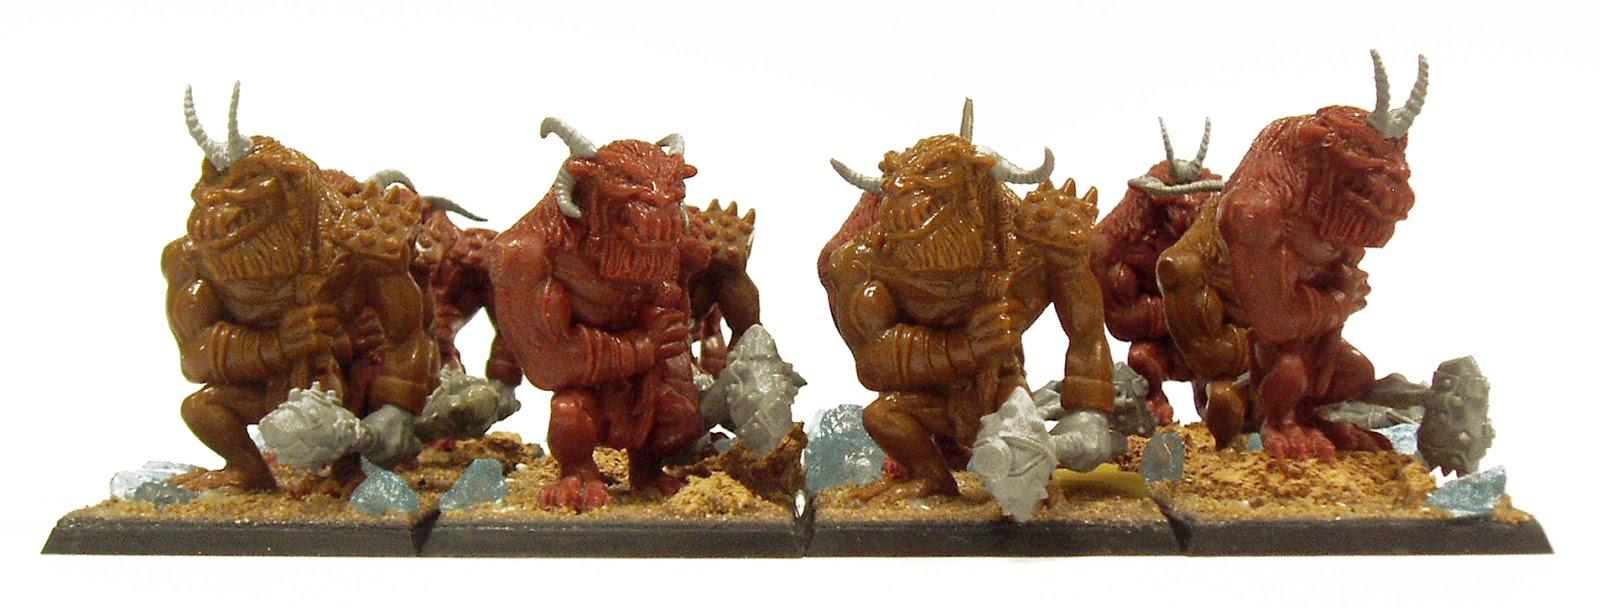 ogres trolls minotaurs conversion ogro troll minotauro